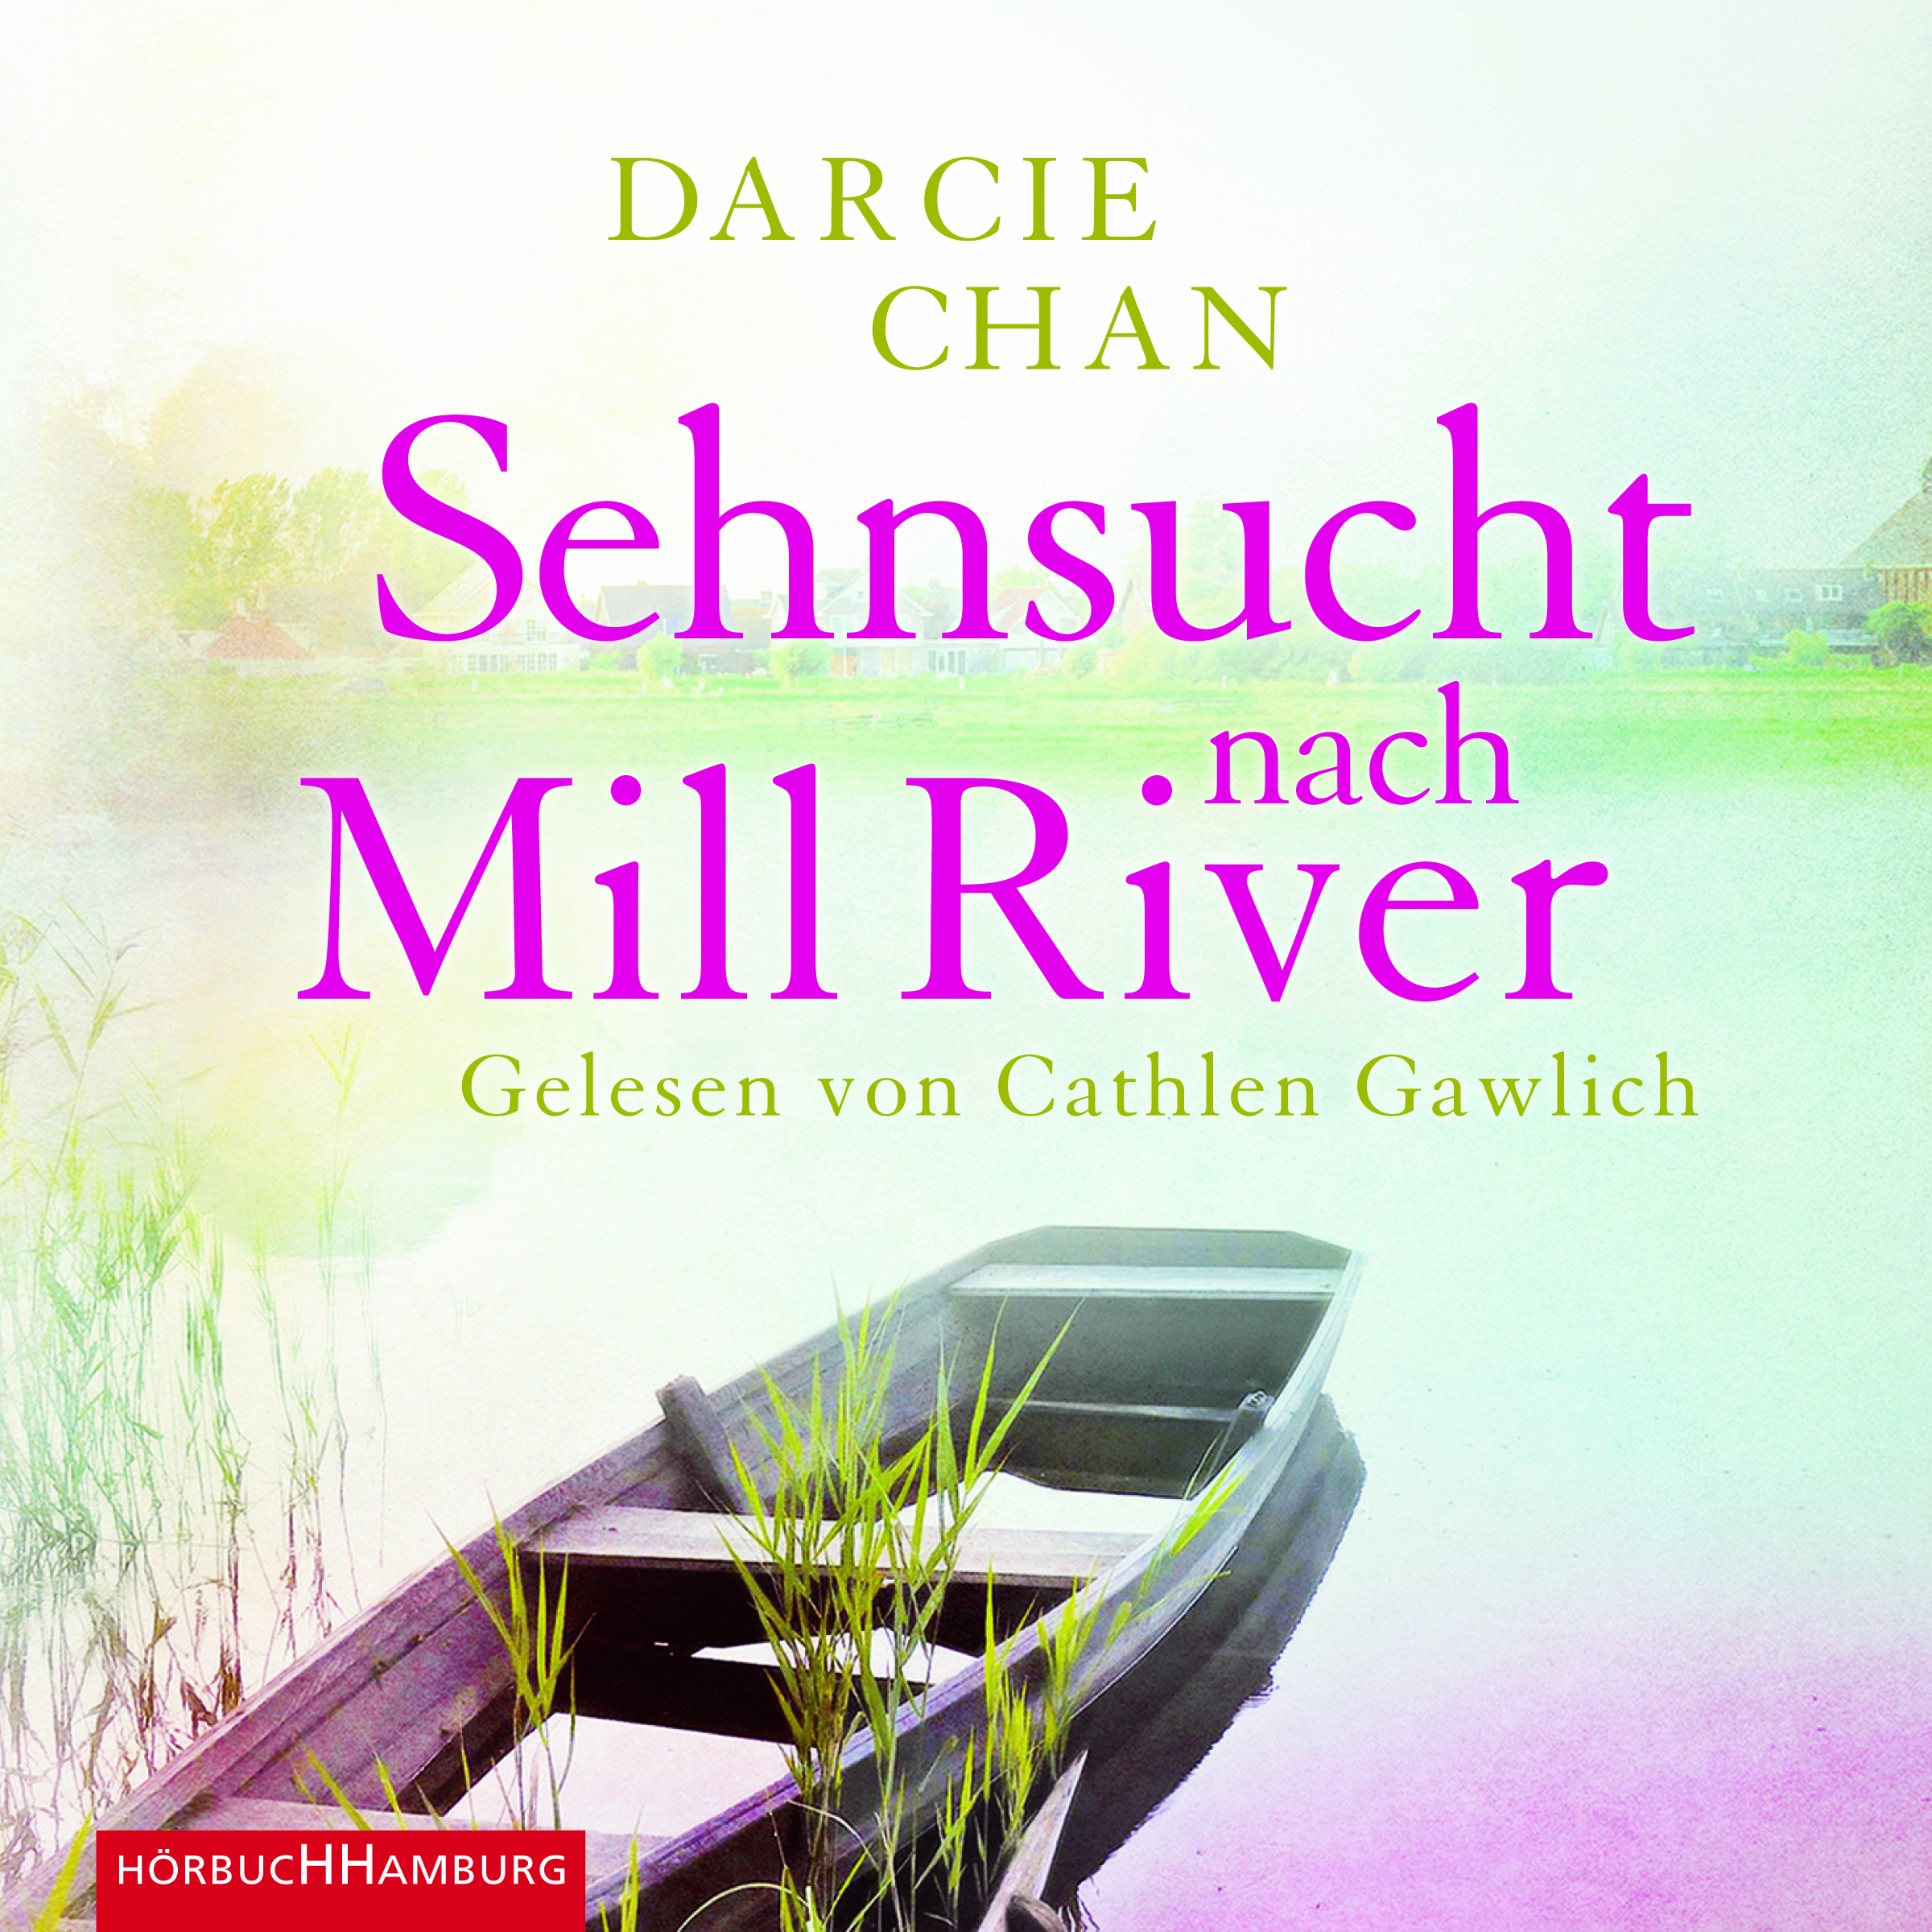 Cover für das Sehnsucht nach Mill River Hörbuch